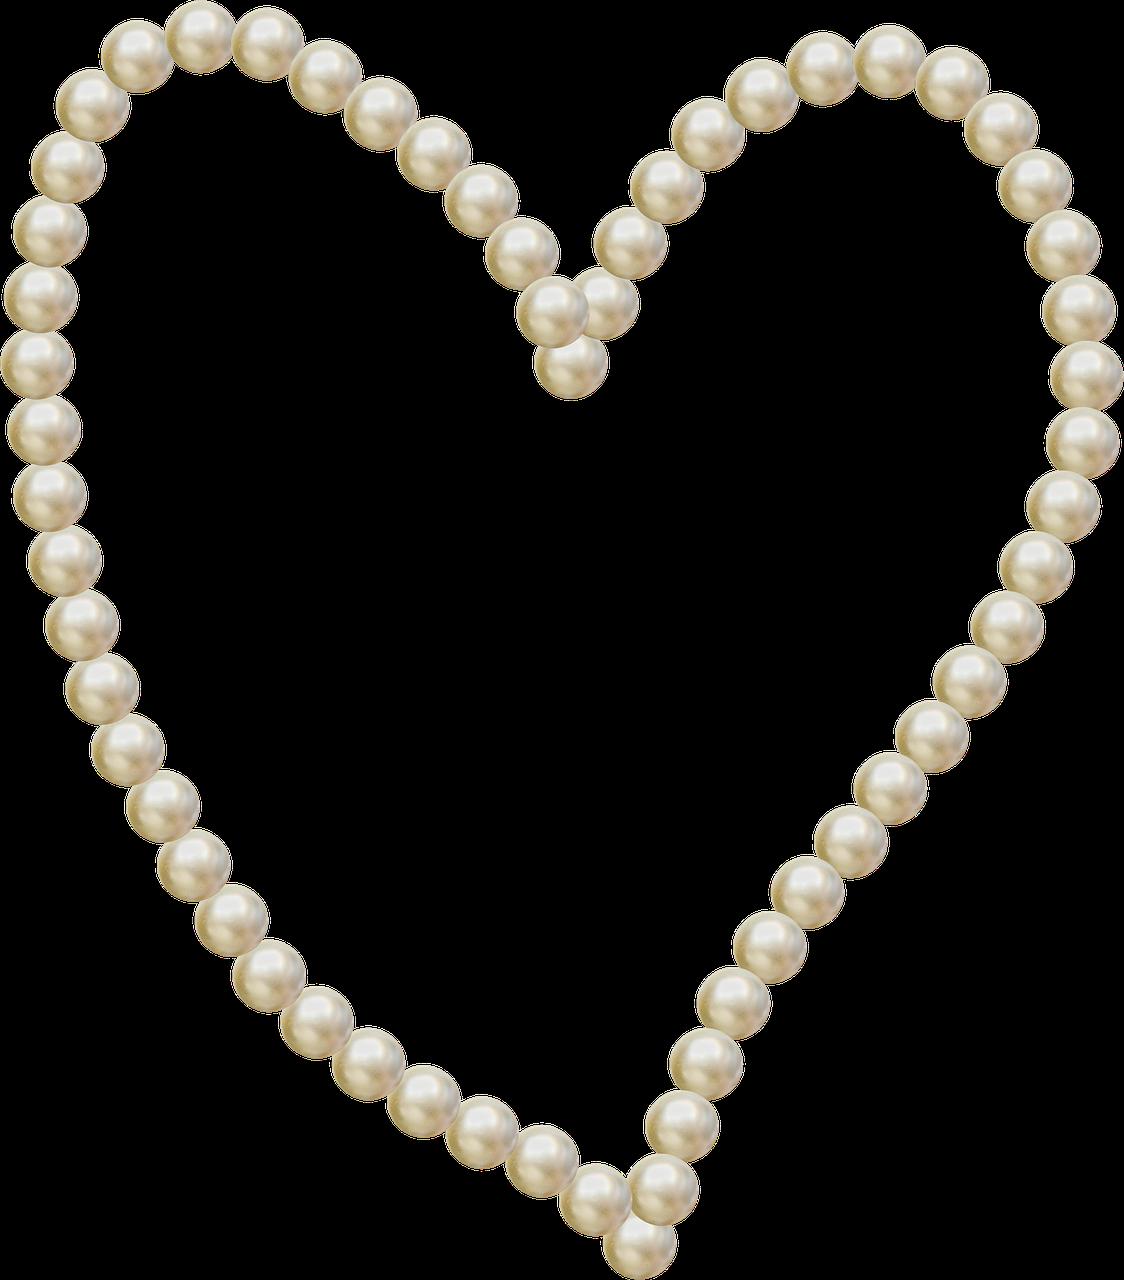 Heart Pearls Frame Love transparent image | Heart | Pinterest | Pearls